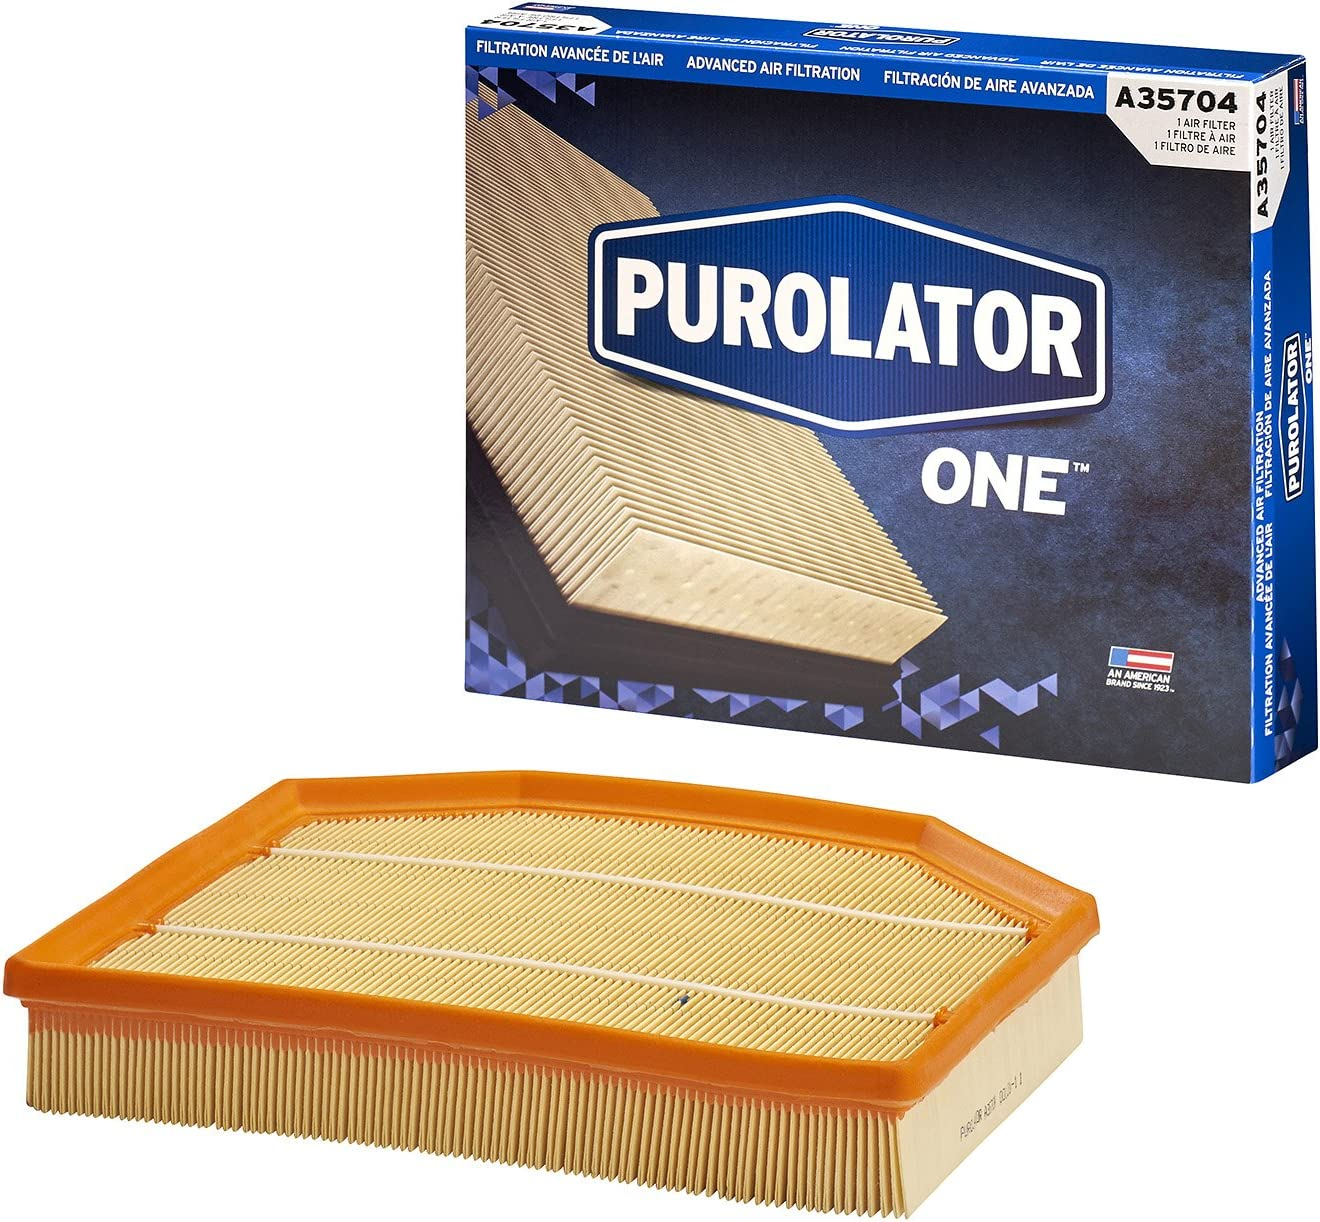 Purolator A35704 PurolatorOne Air Filter